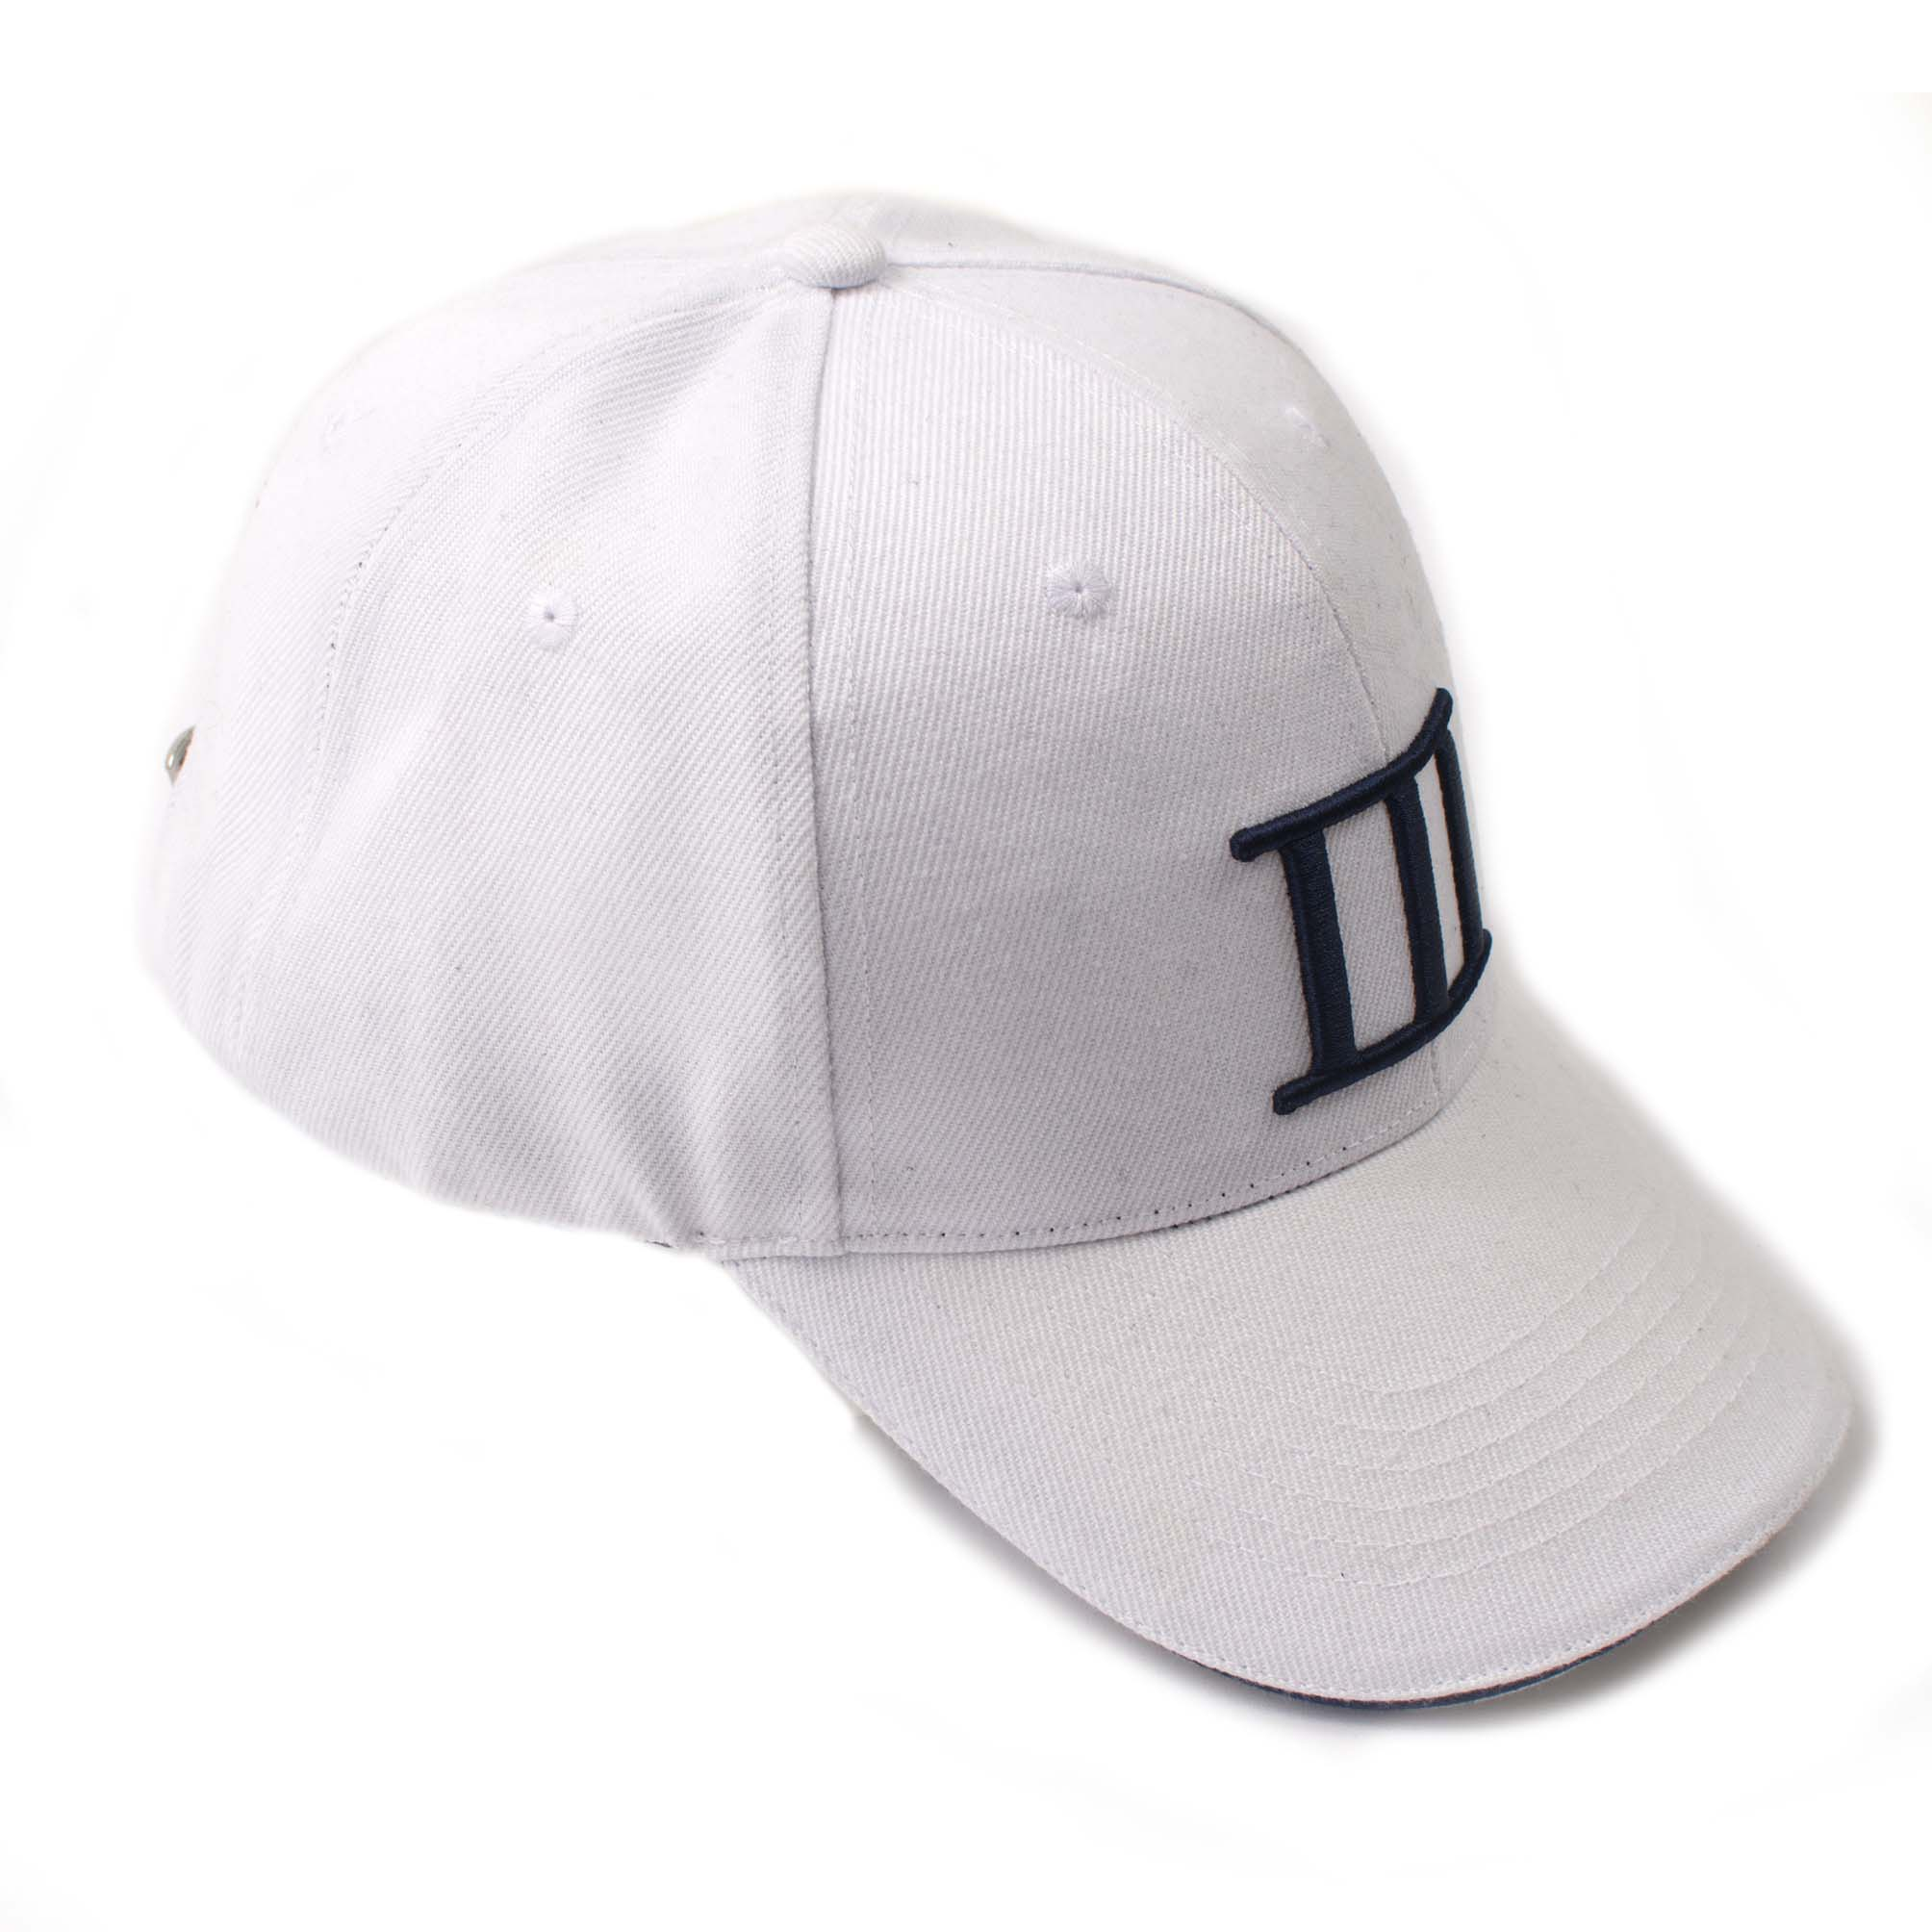 Cap branded Tresanti white